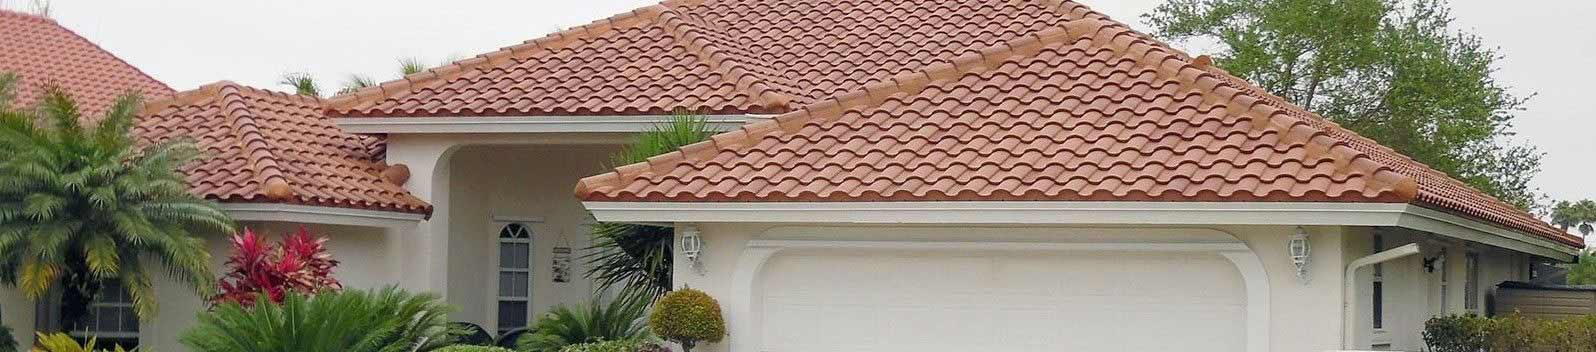 roofing pembroke pines fl